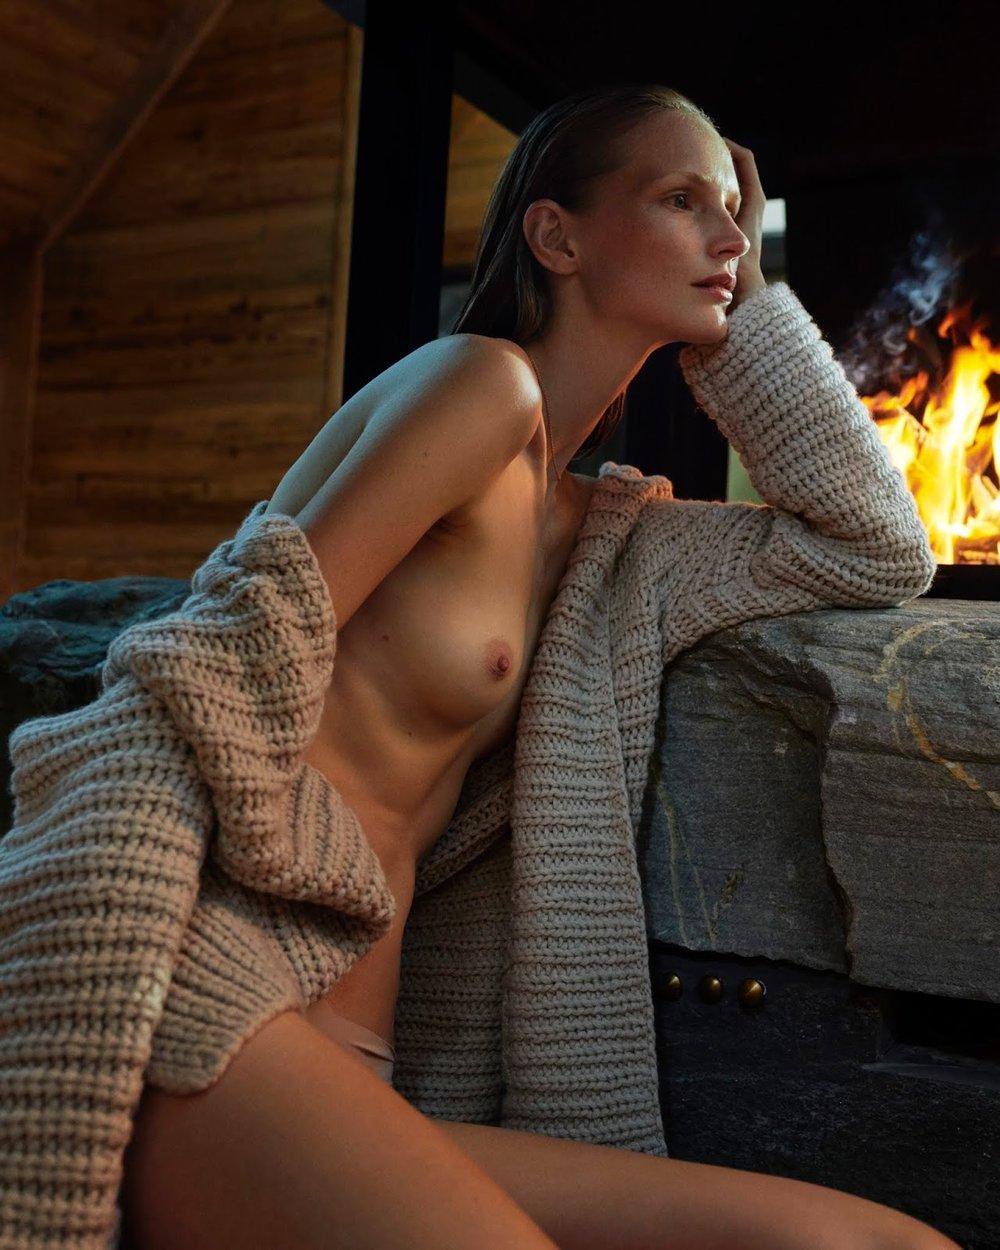 Katrin Thormann by Tobias Lundkvist for ELLE Germany (7).jpg